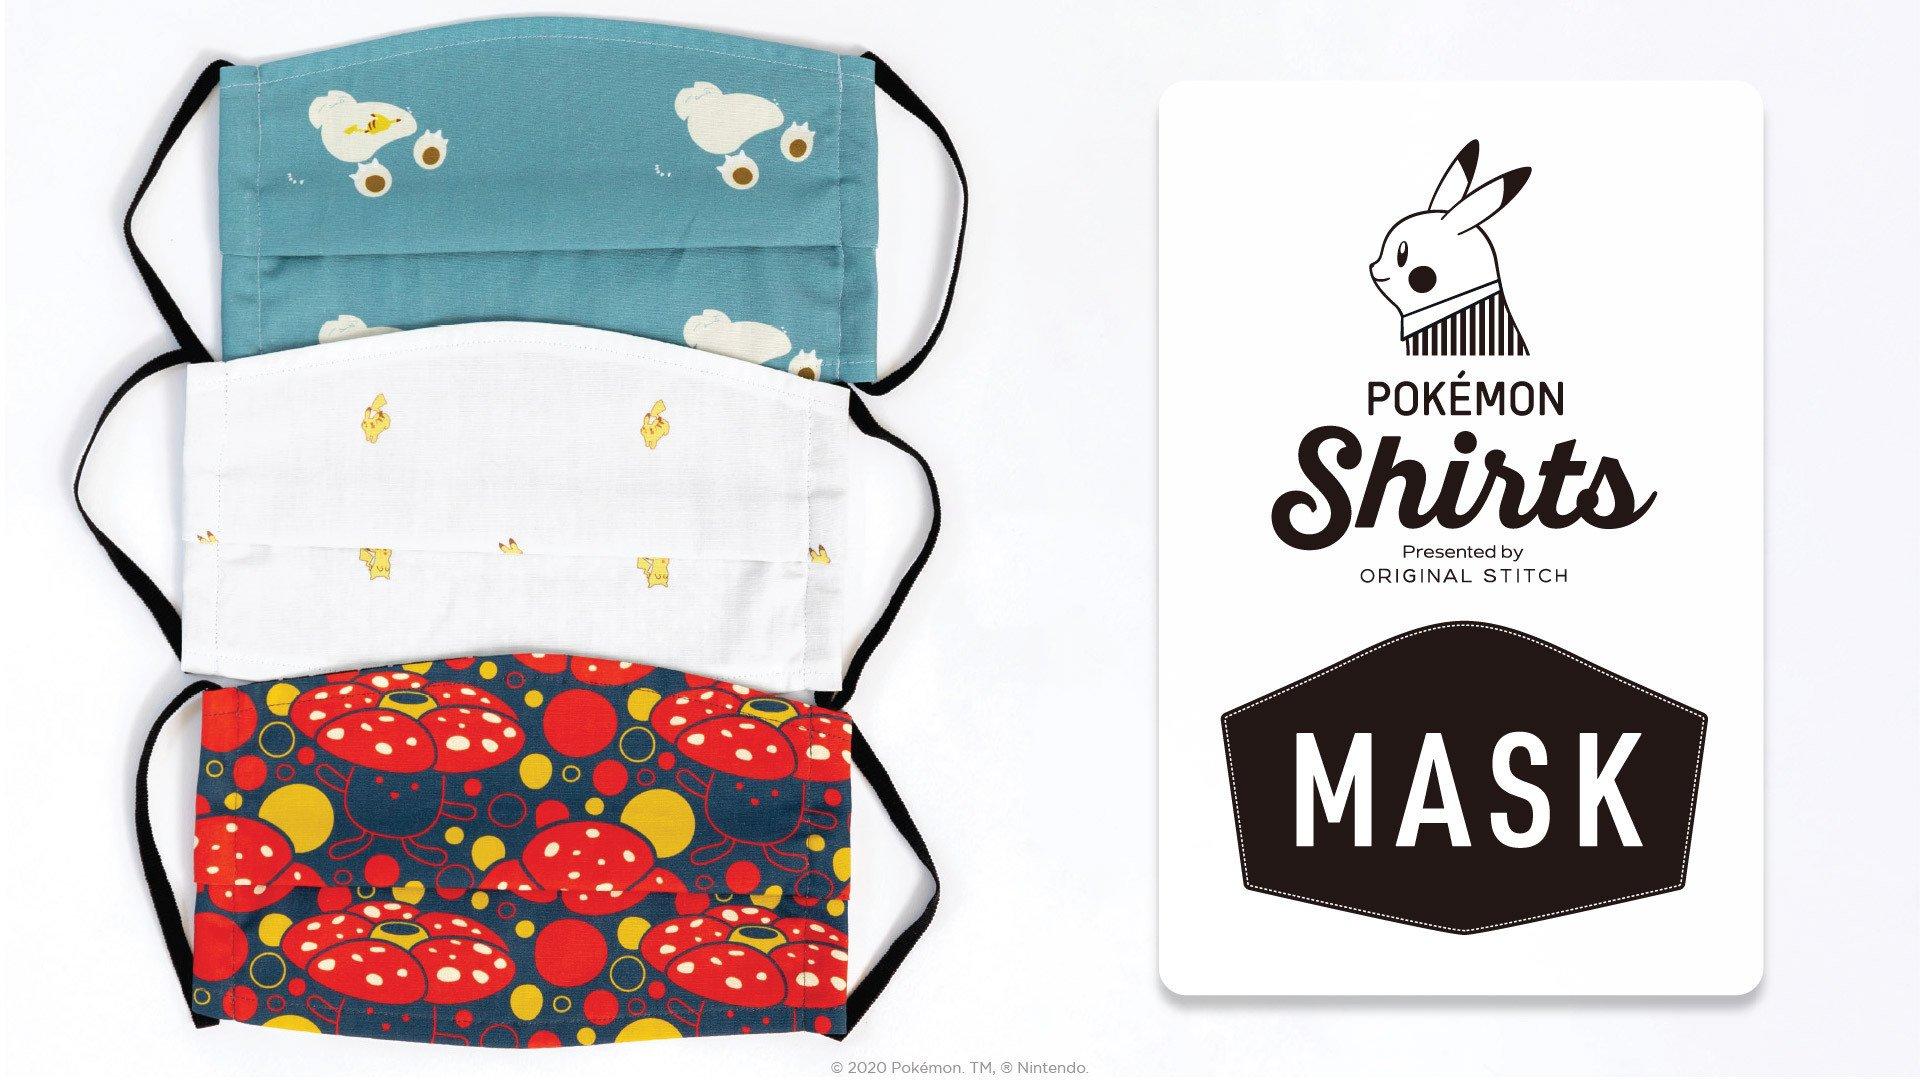 Official Pokémon Masks available now at Original Stitch | Pokémon GO Hub - Pokemon GO Hub